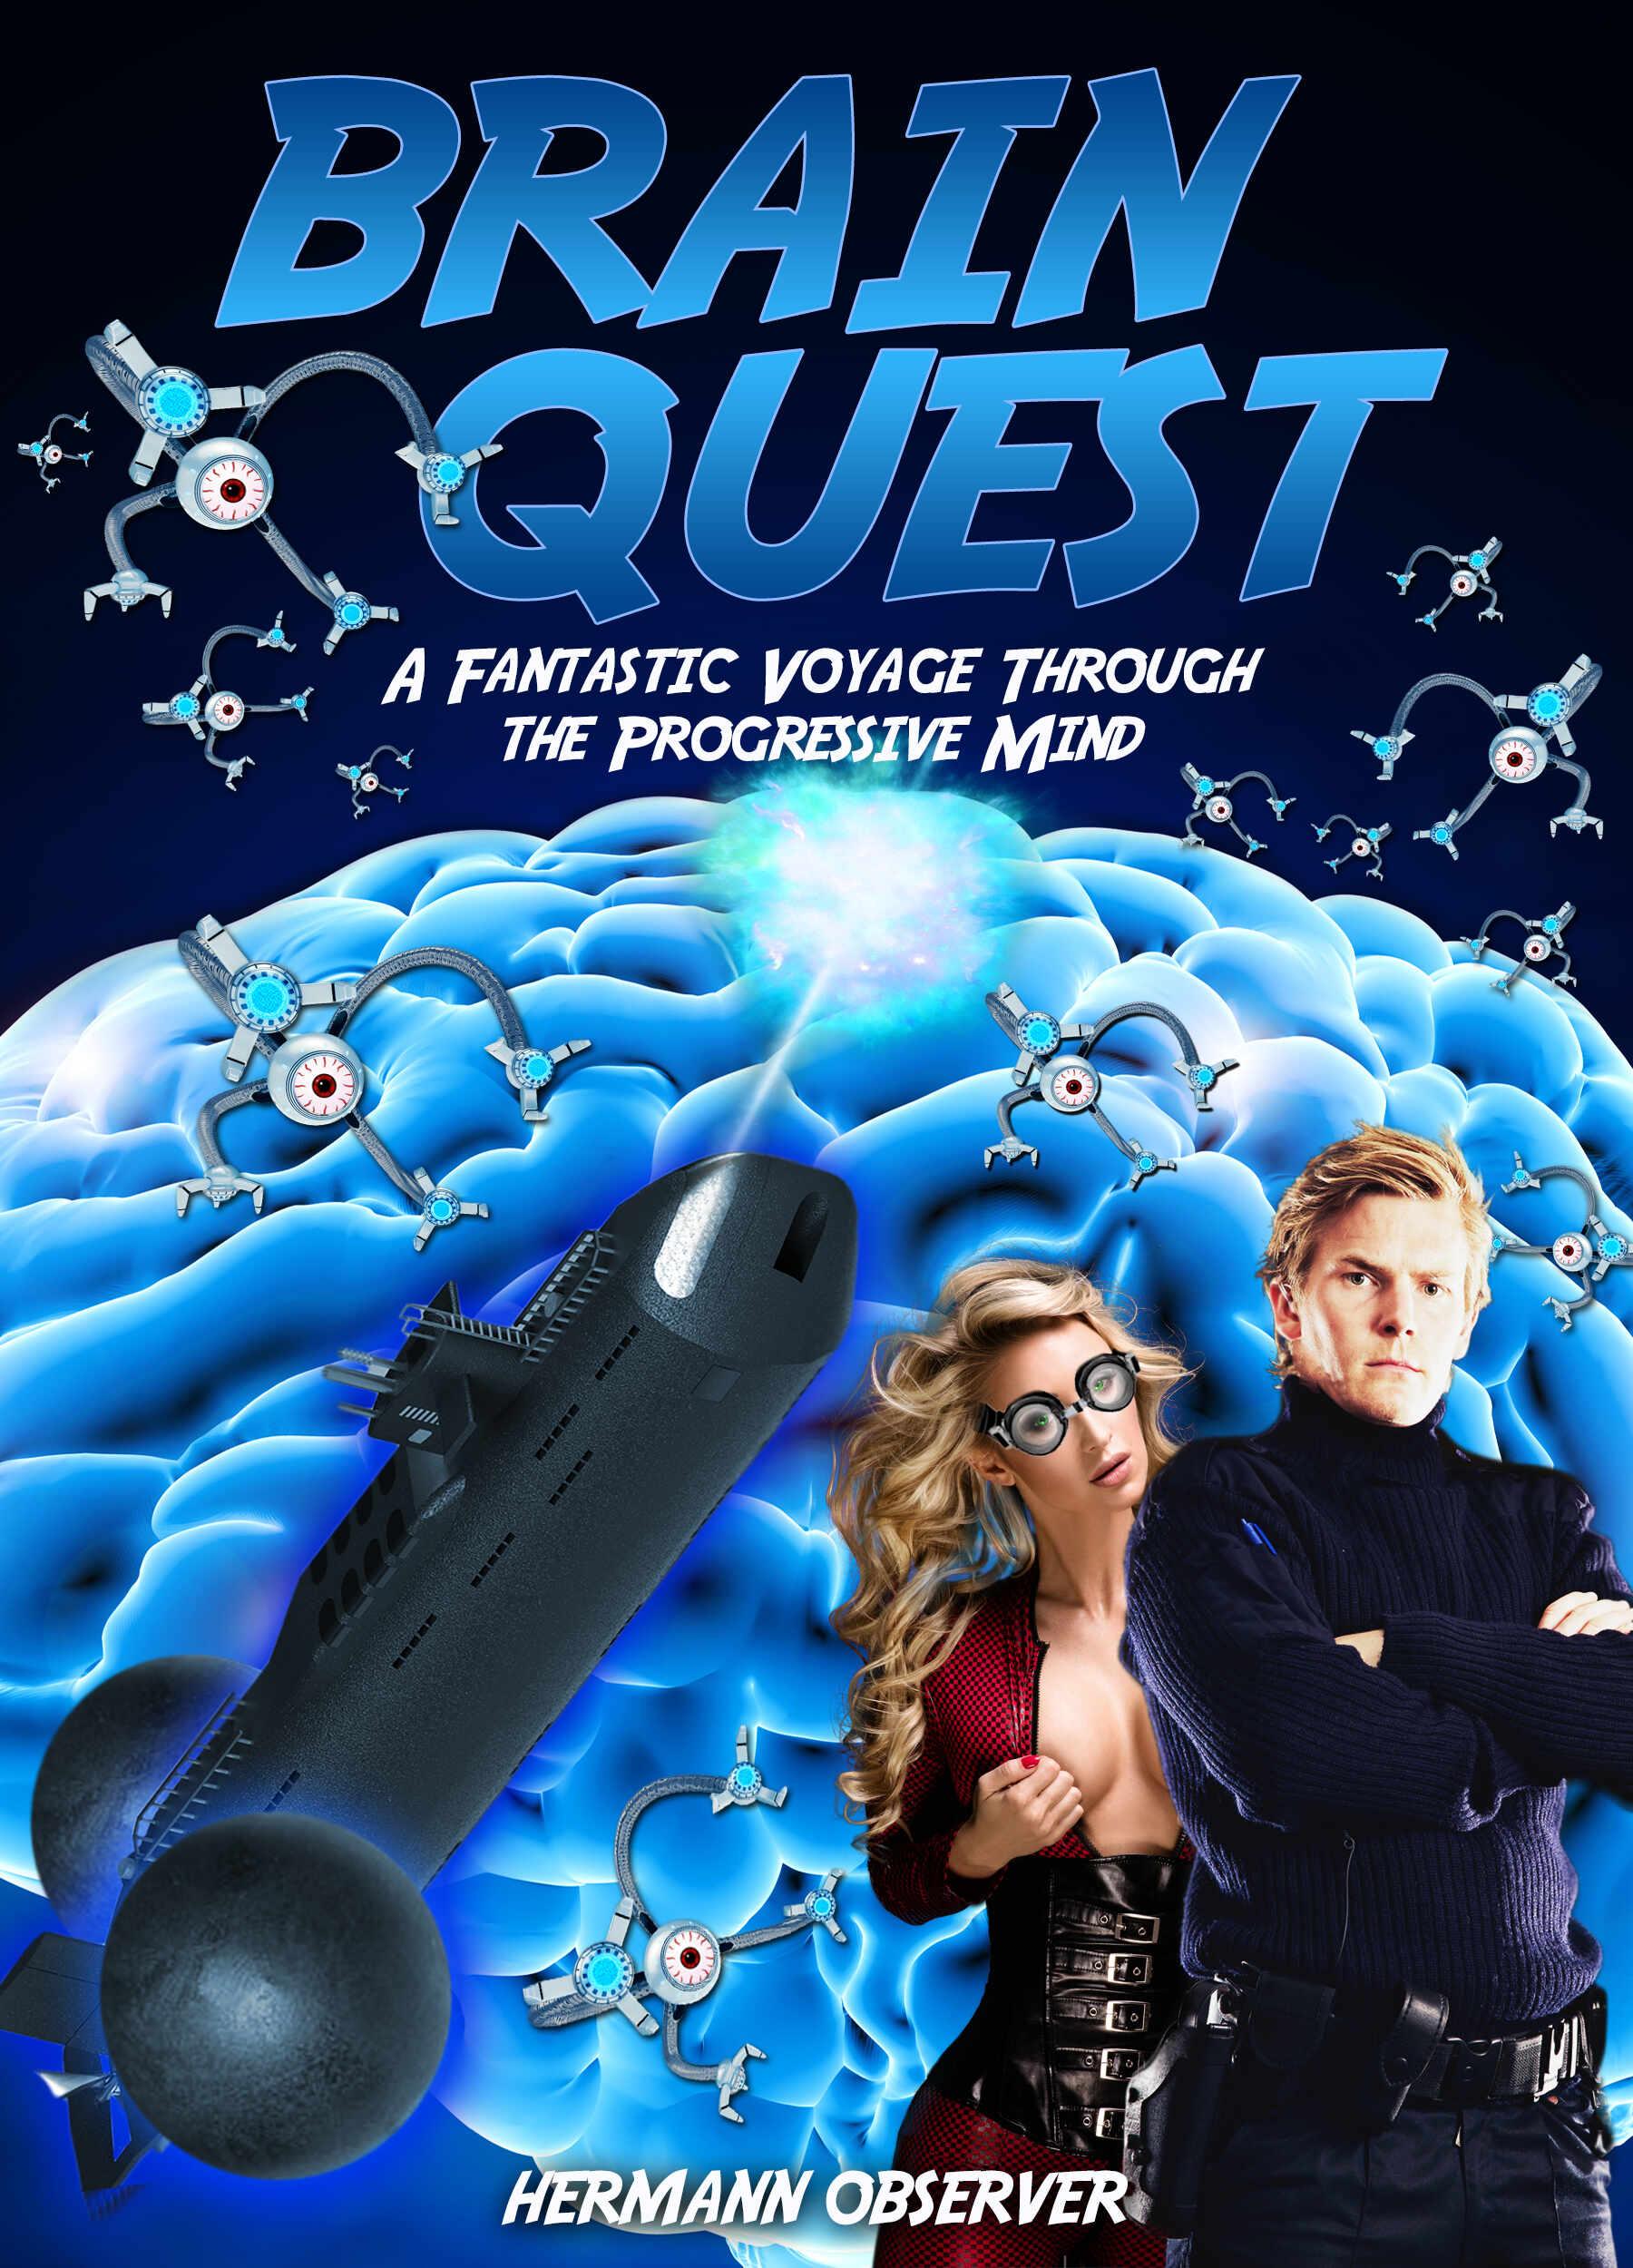 Brain Quest - A Fantastic Voyage through the Progressive Mind's Book Image